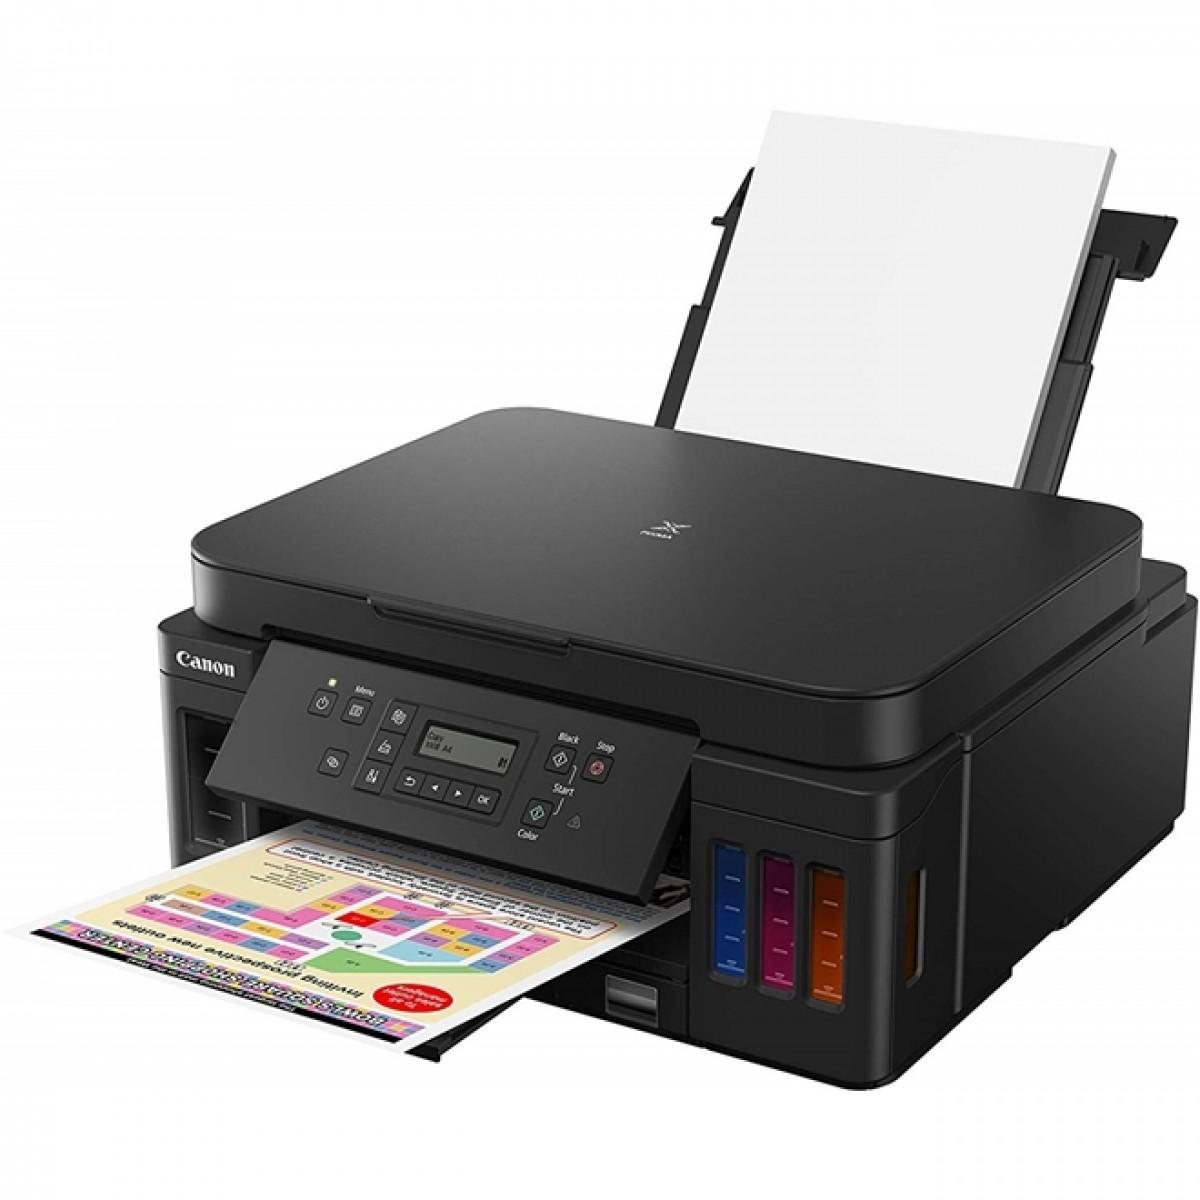 Impressora Multifuncional Canon, MegaTank G6010, Wireless, Jato de Tinta, Colorida, Bivolt, 3113C005AA